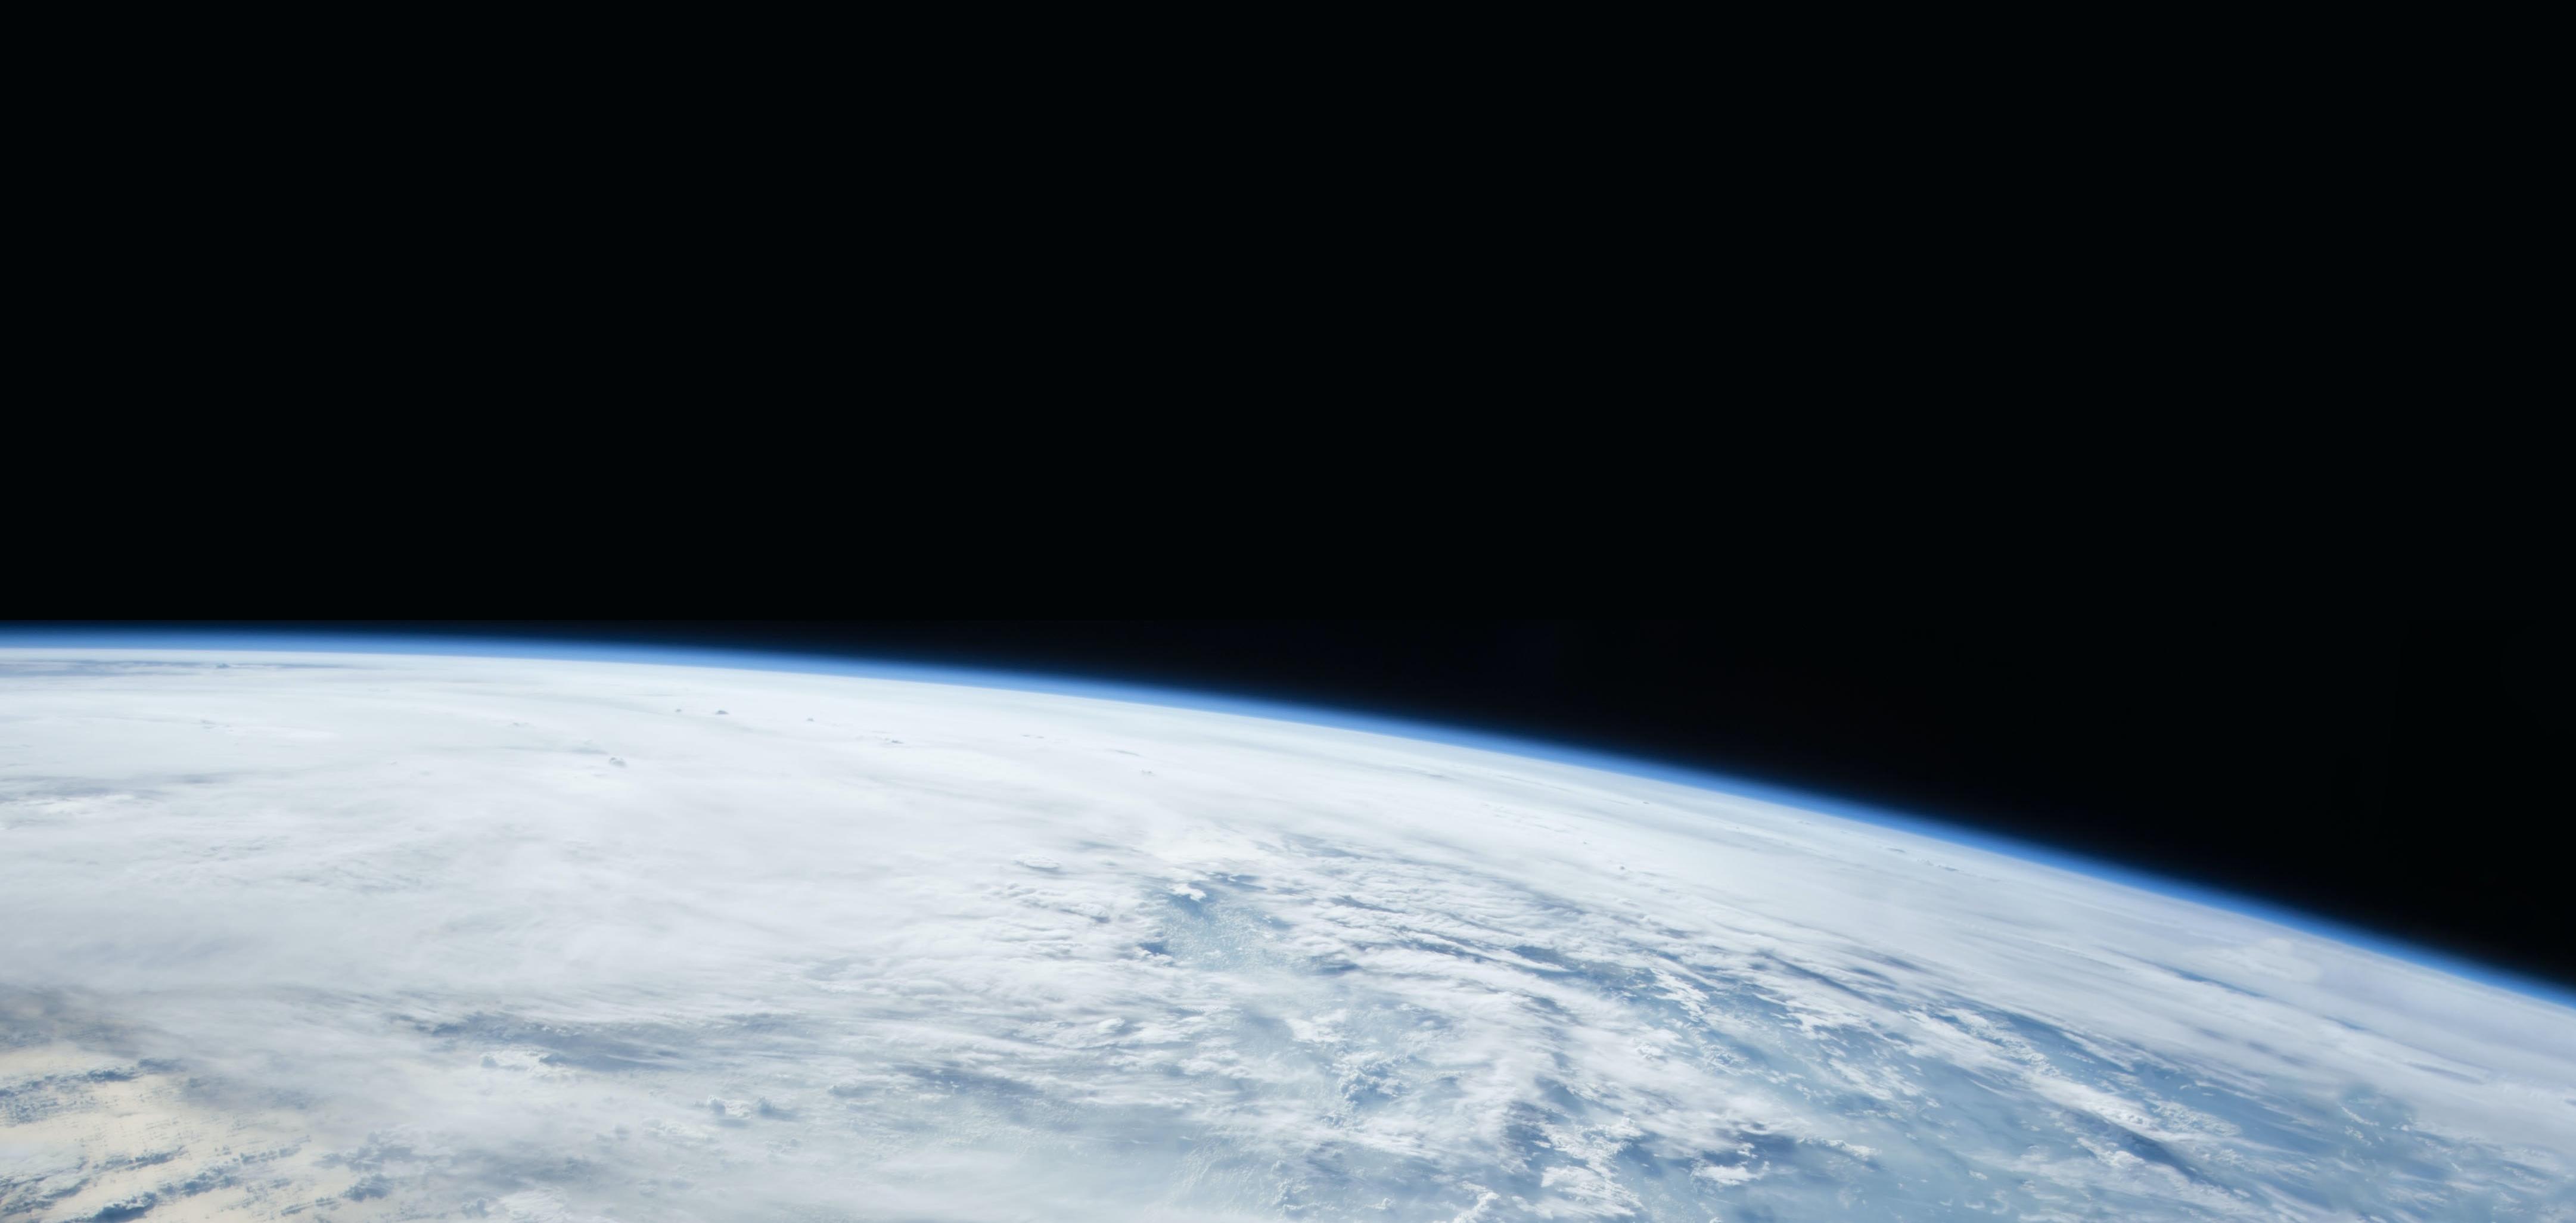 earth-nasa-unsplash